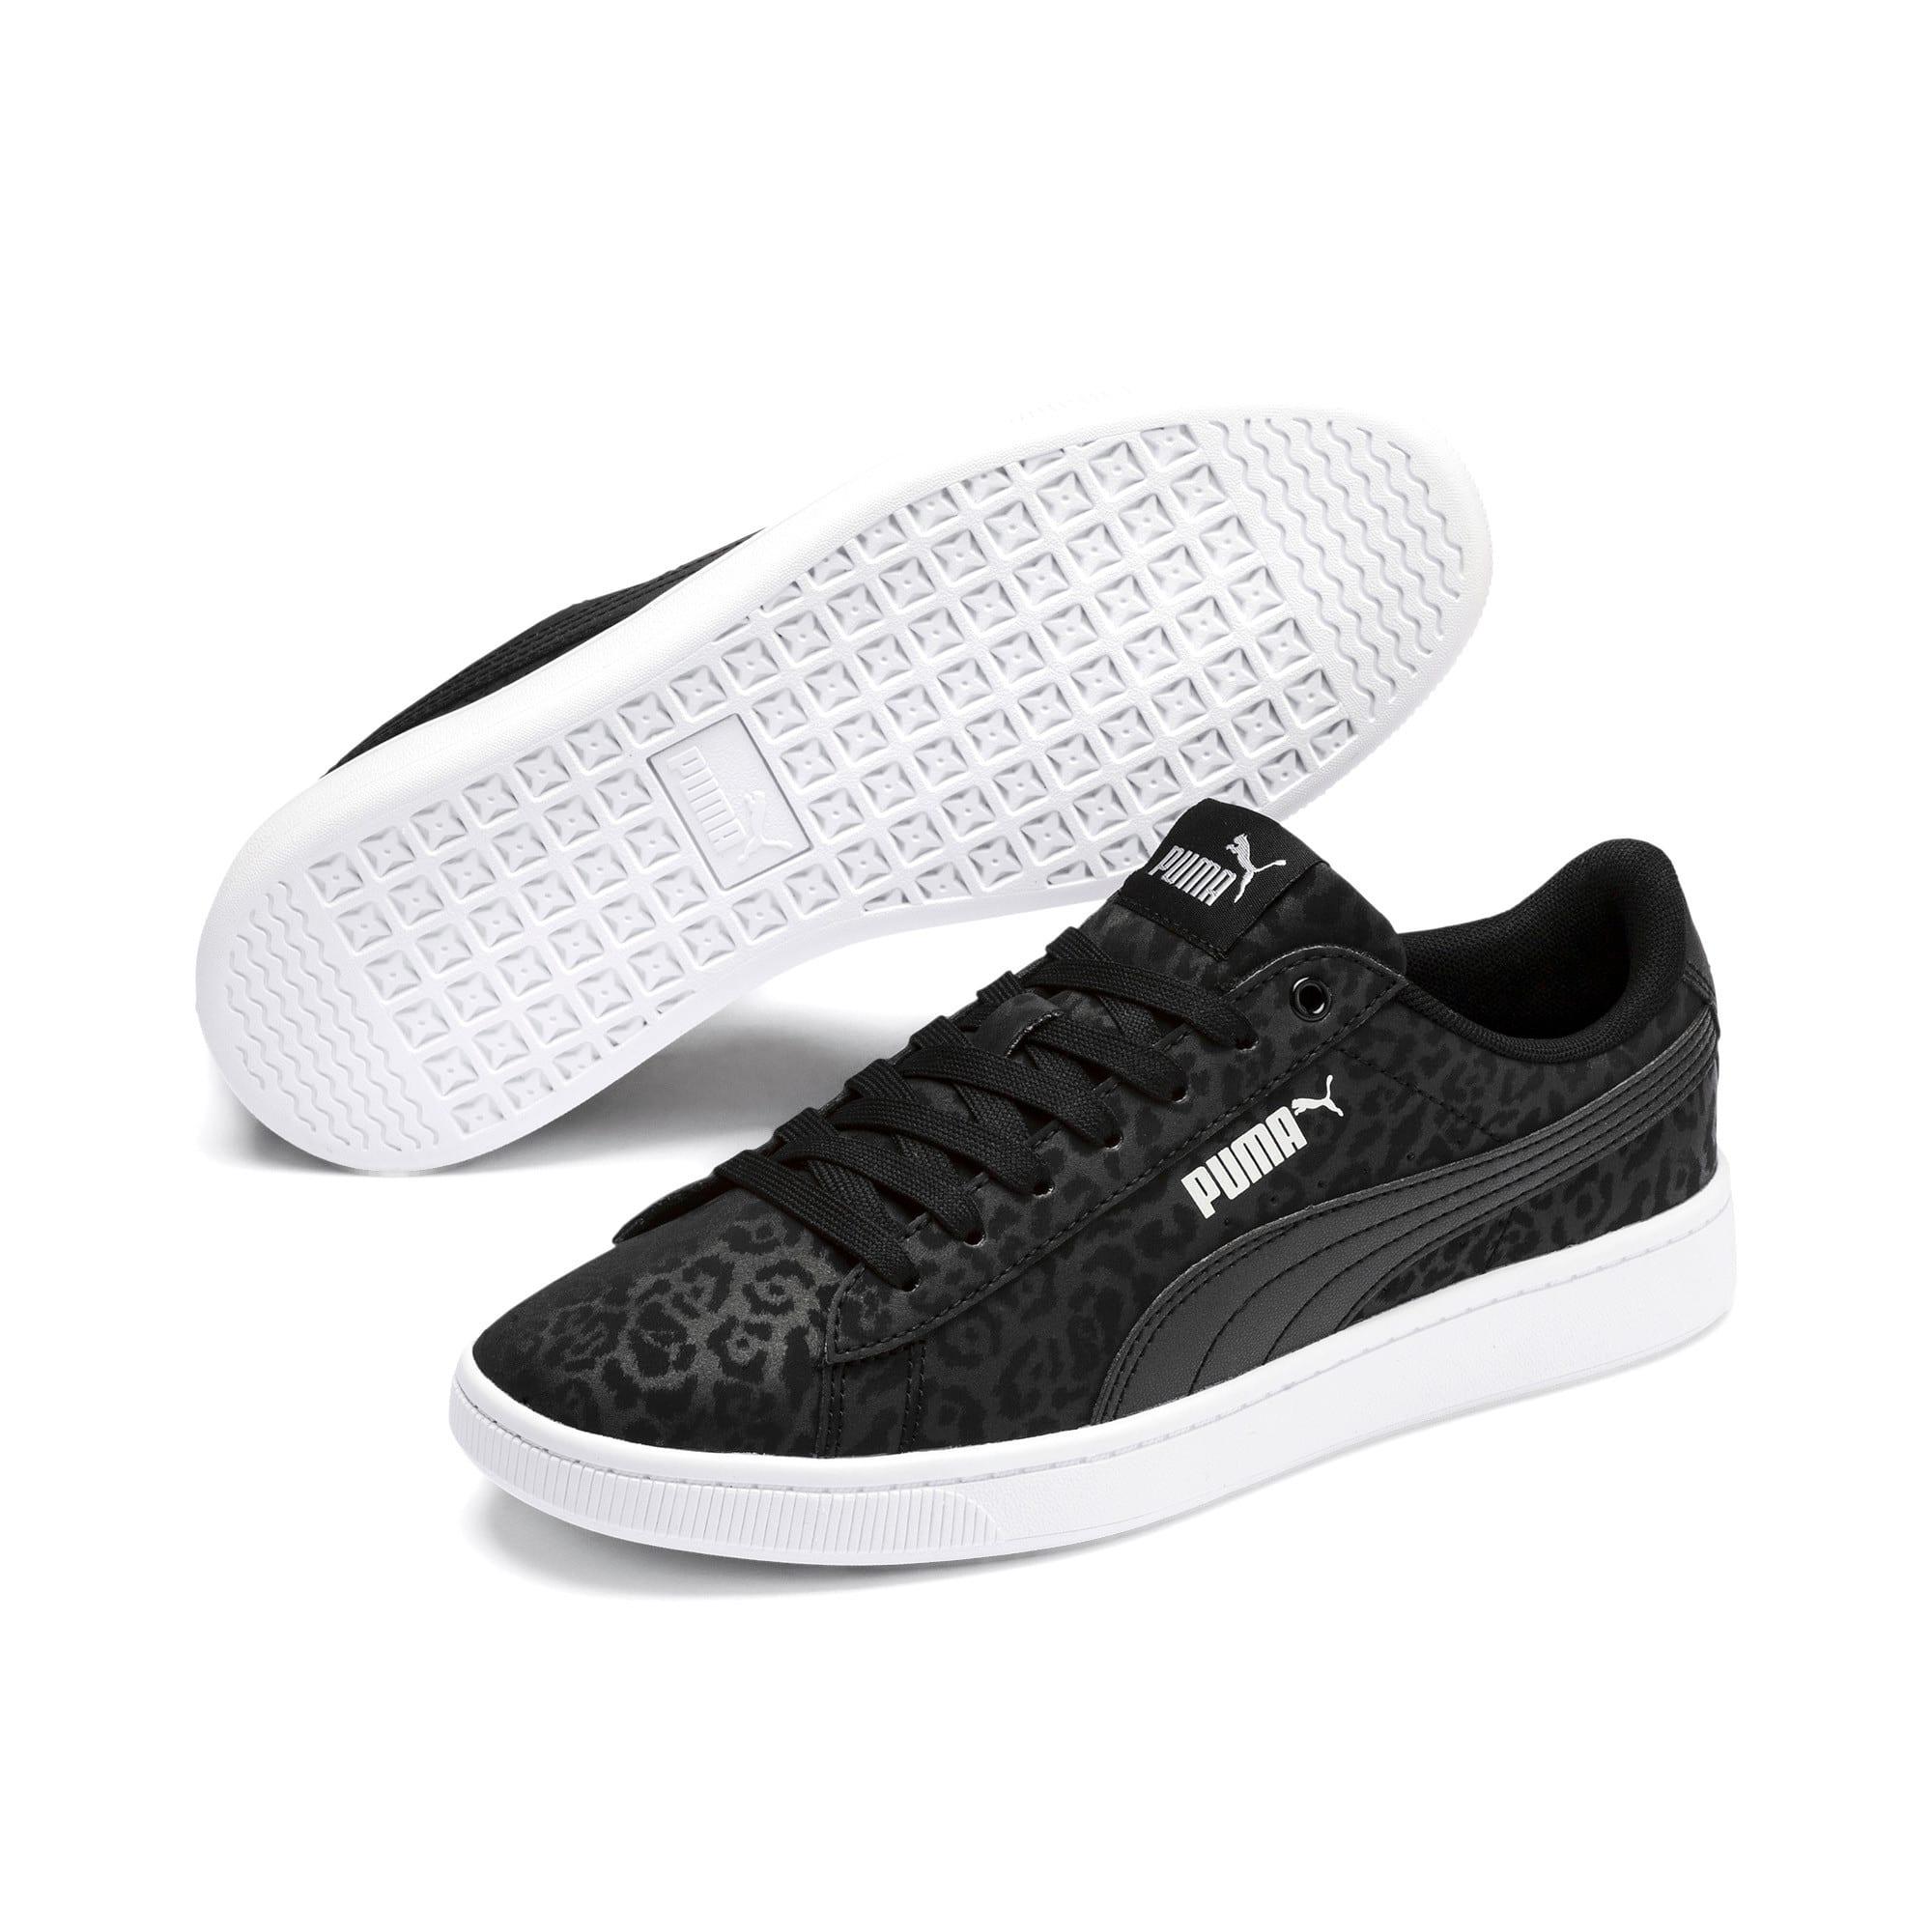 Thumbnail 3 of PUMA Vikky v2 Wildcat Women's Sneakers, Puma Black-Puma Silver-White, medium